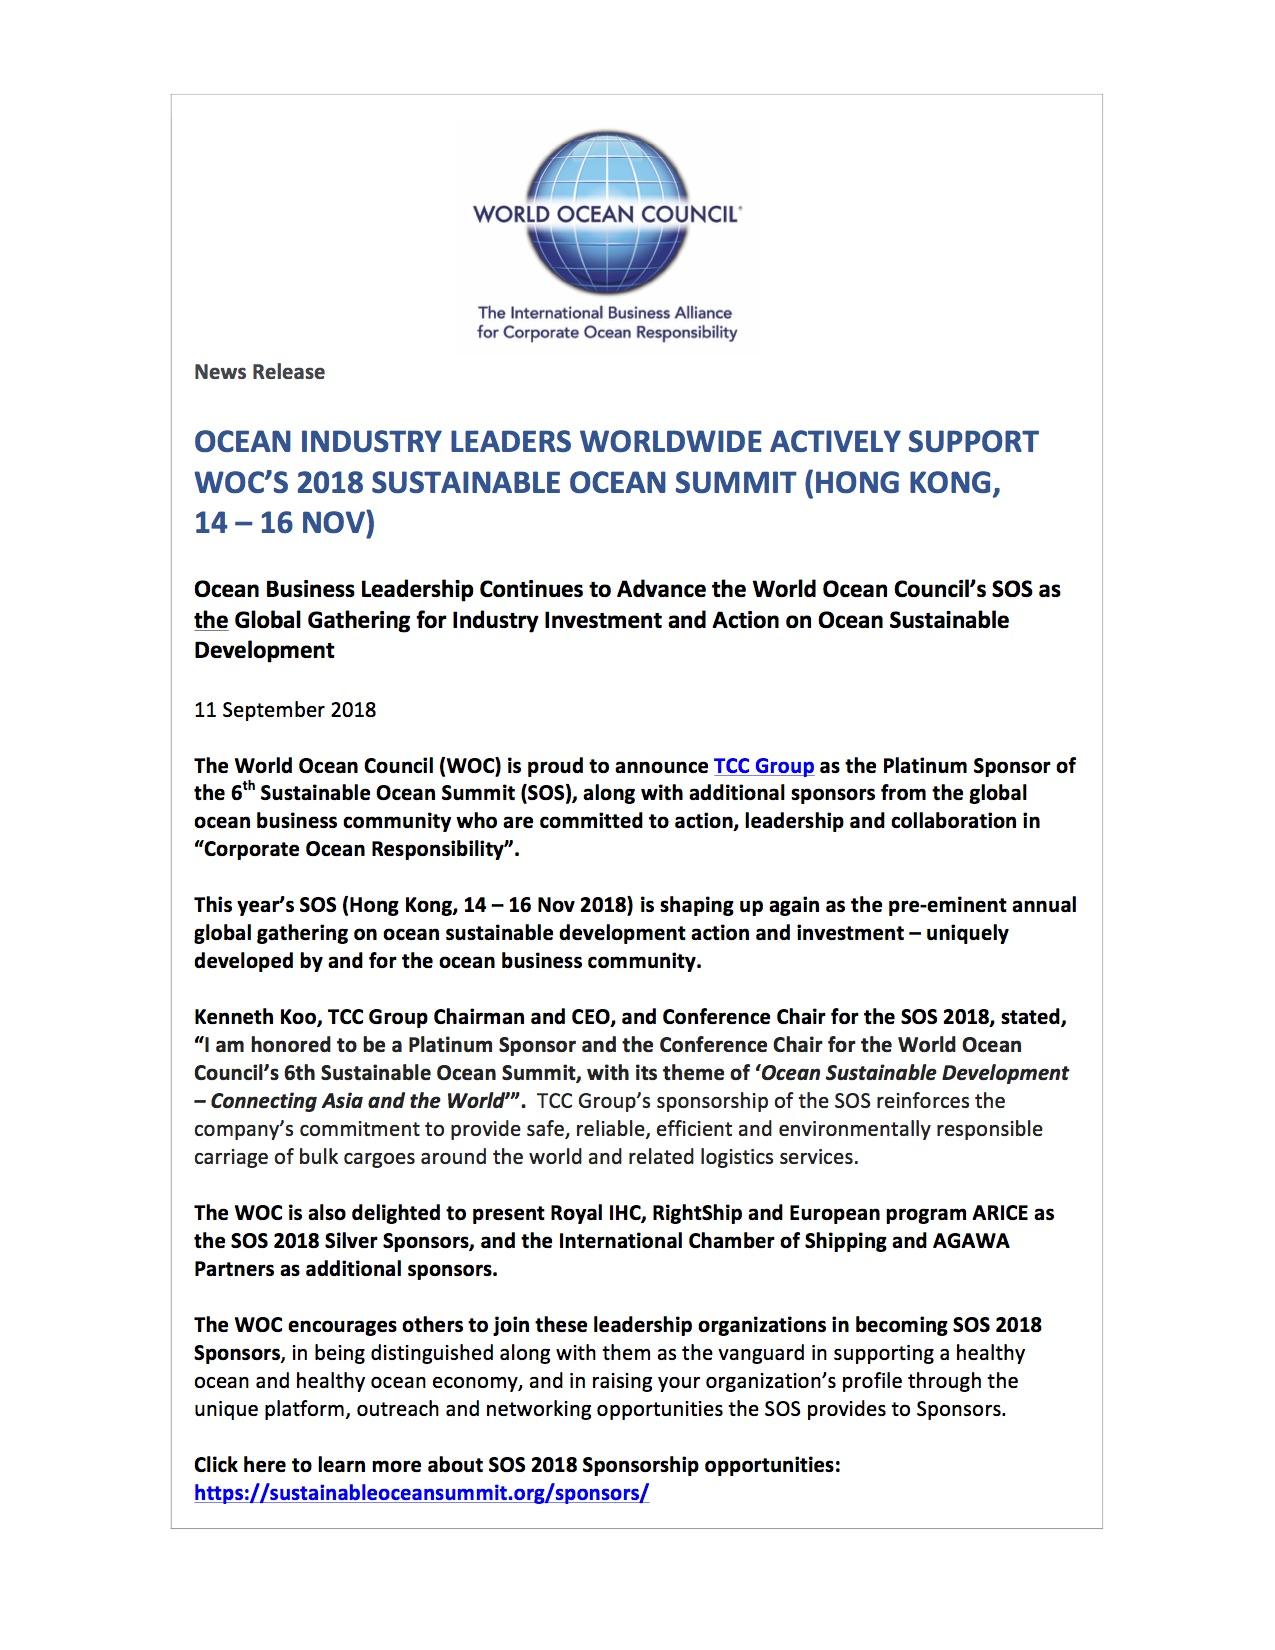 Ocean Industry Leaders Worldwide Actively Support WOC's 2018 Sustainable Ocean Summit (Hong Kong, 14 - 16 Nov) - 11 September 2018